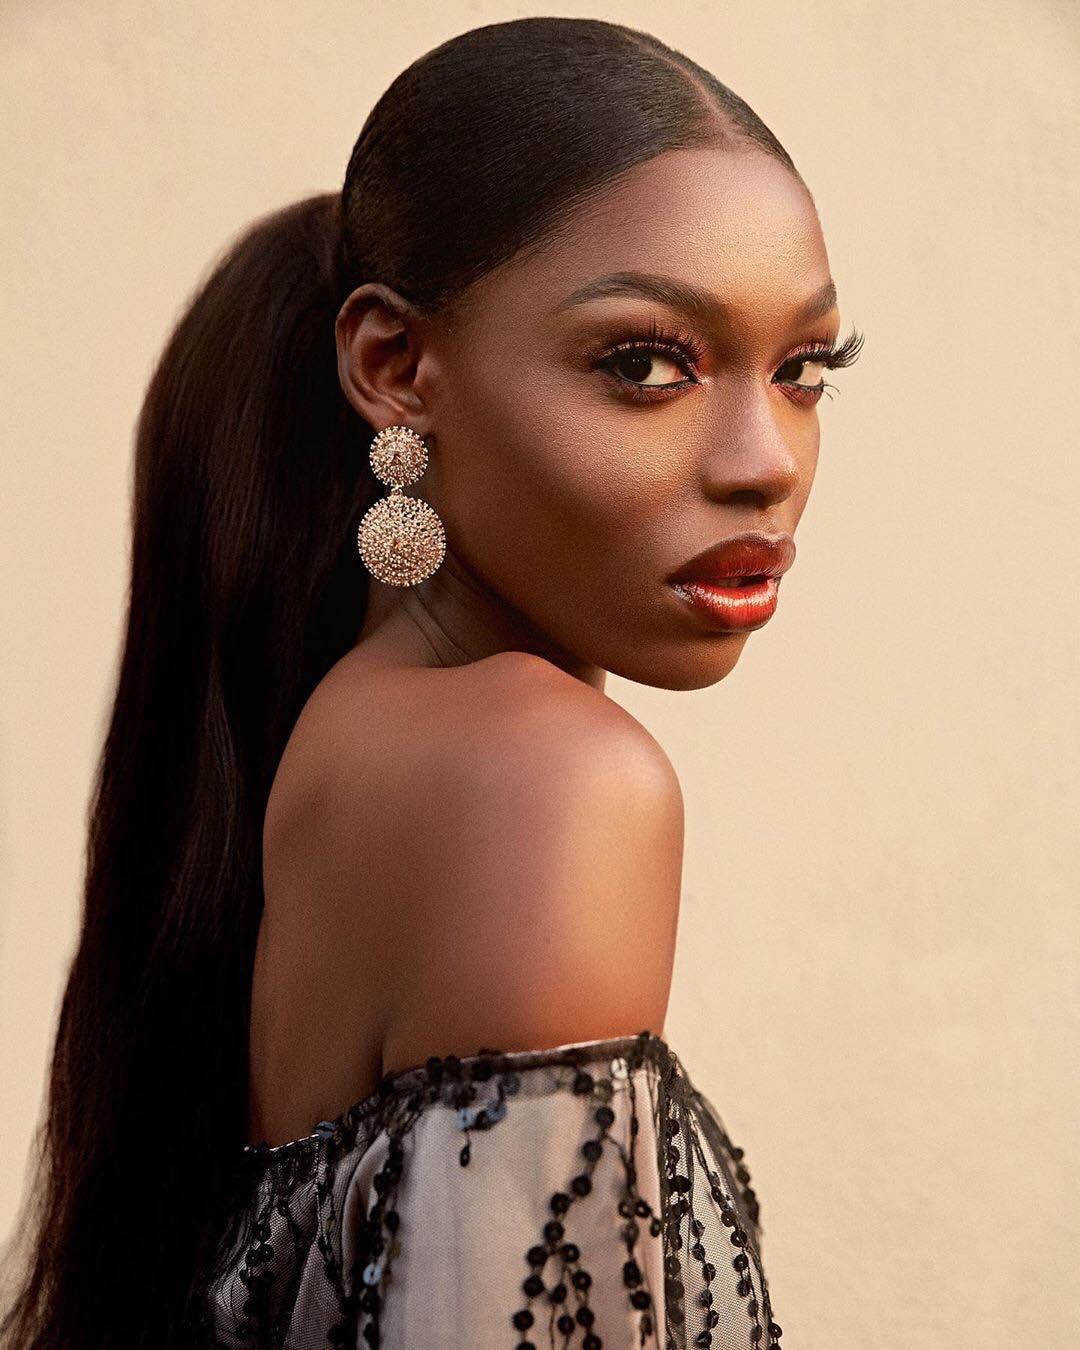 Beautiful In 2019: #MBGN2019: Meet The Most Beautiful Girl In Nigeria 2019